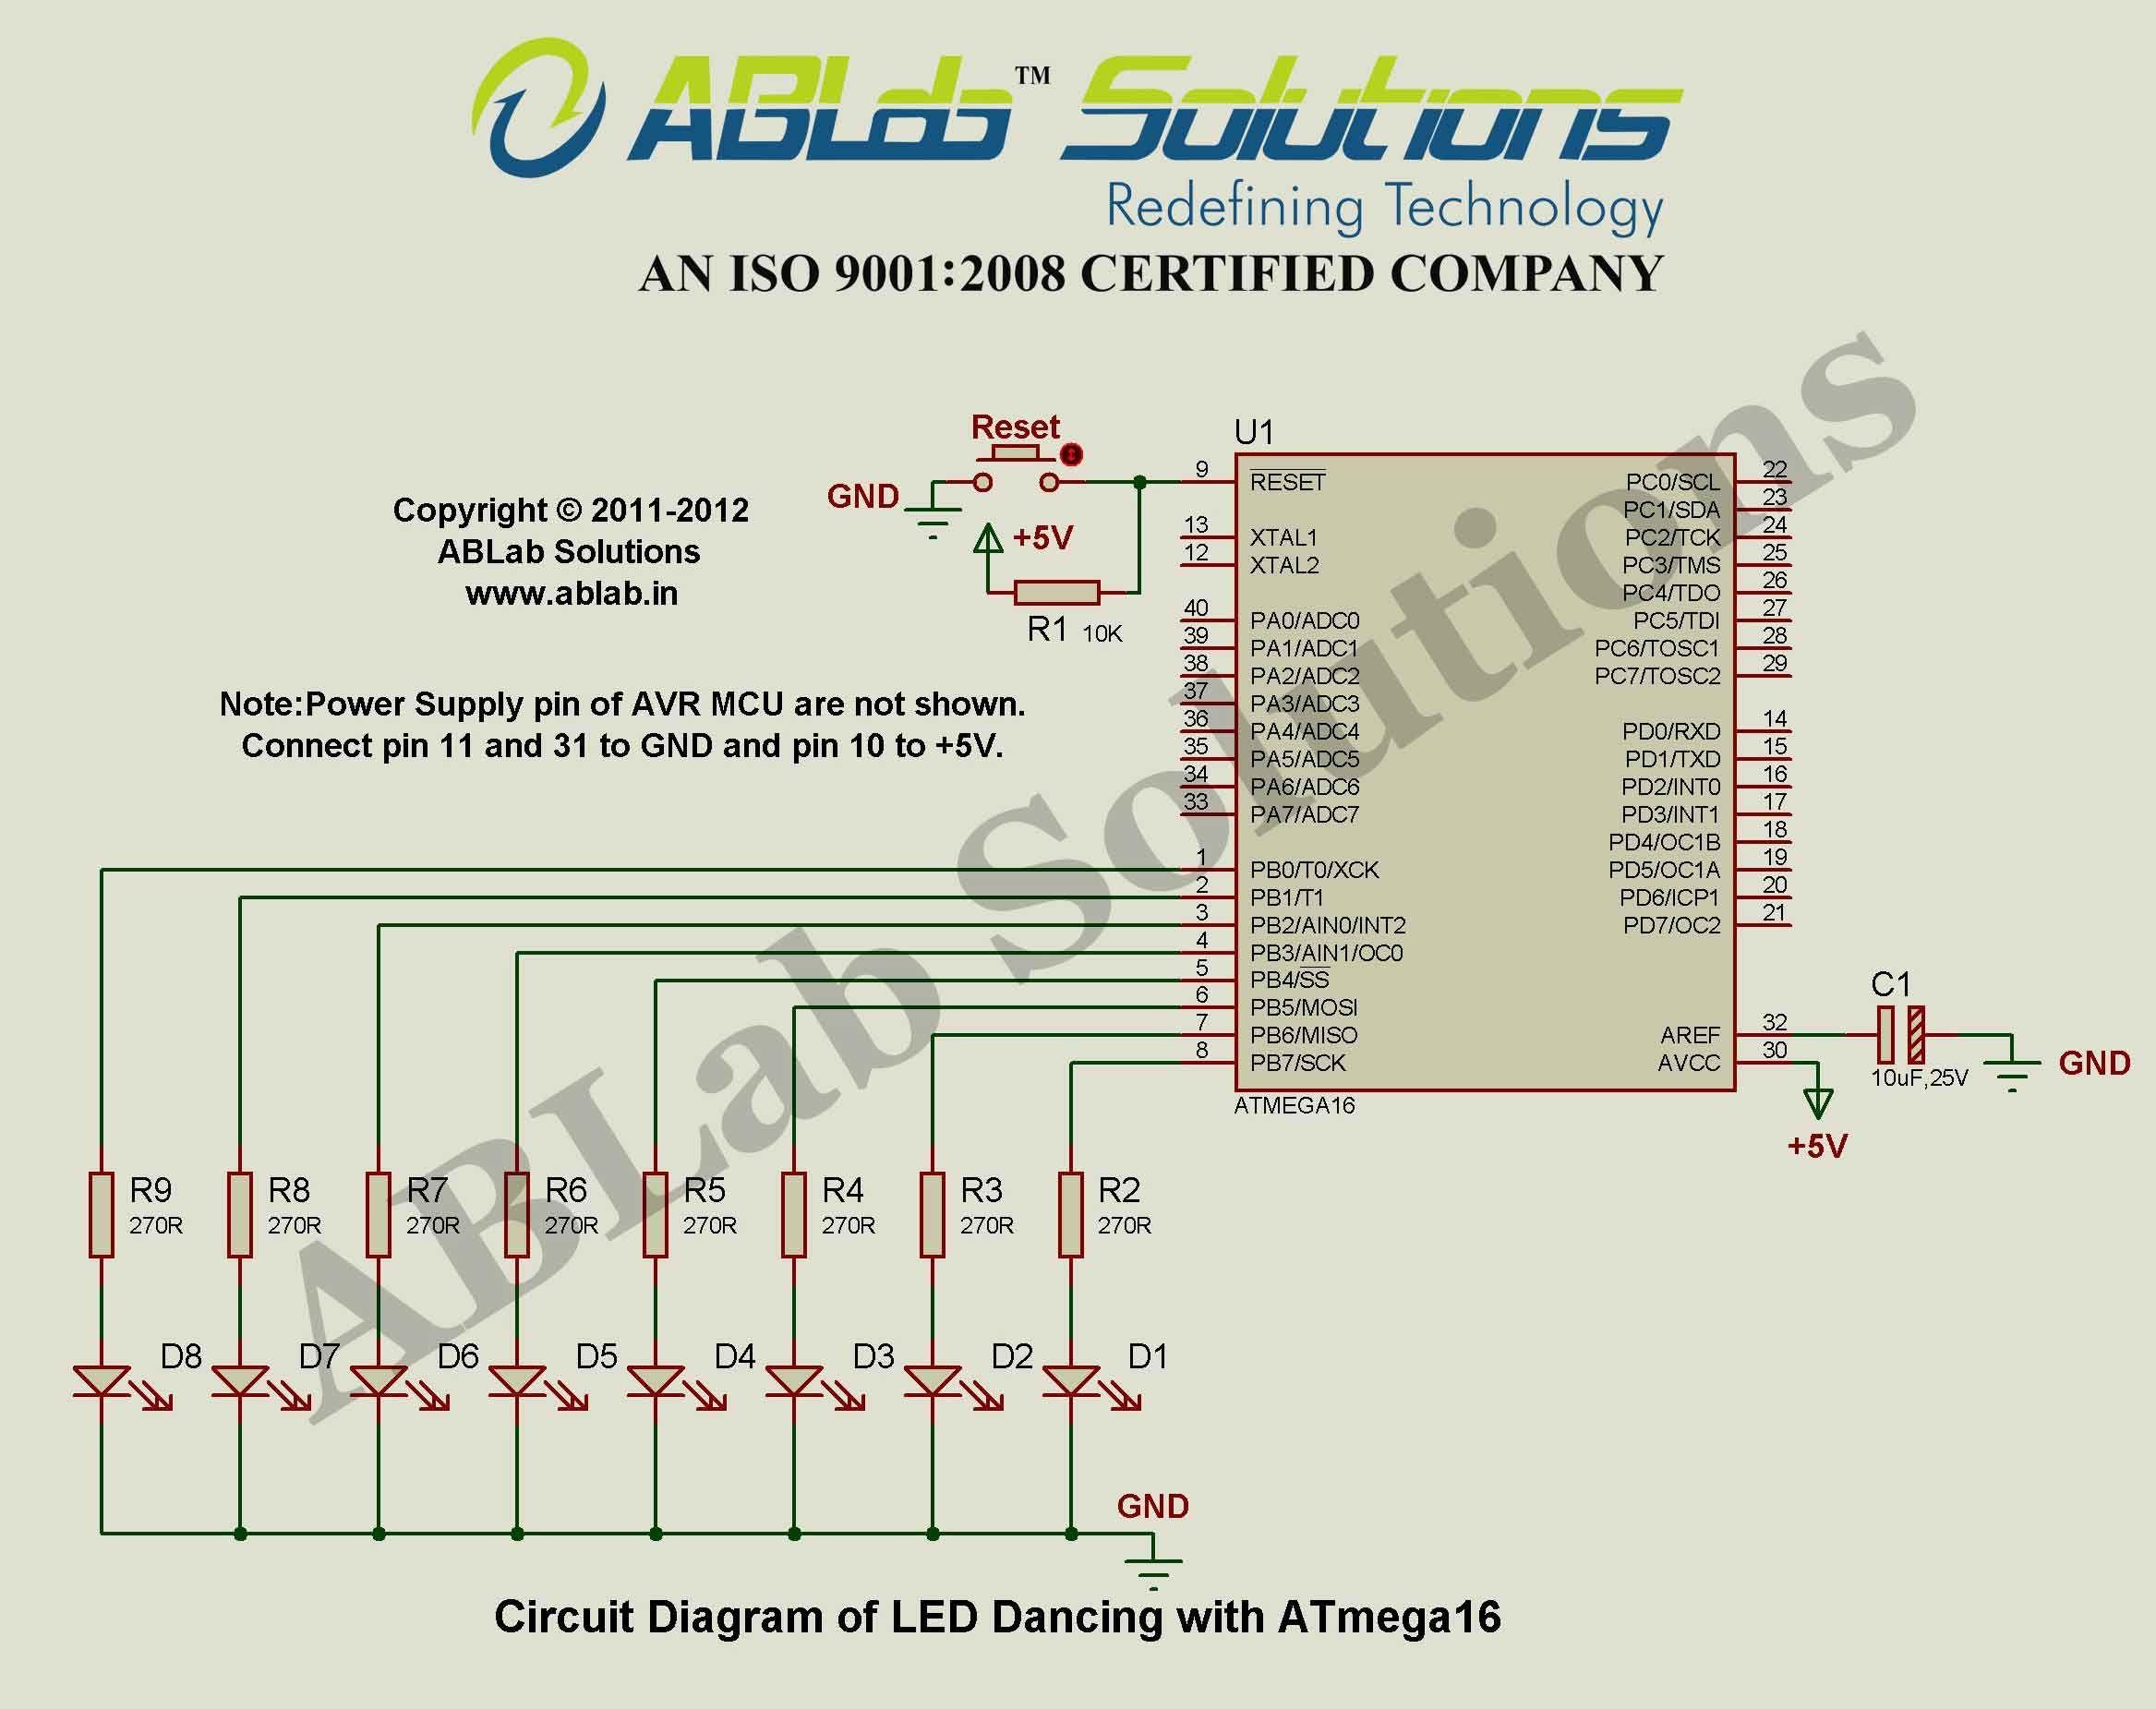 medium resolution of led dancing with avr atmega16 microcontroller circuit diagram ablab solutions